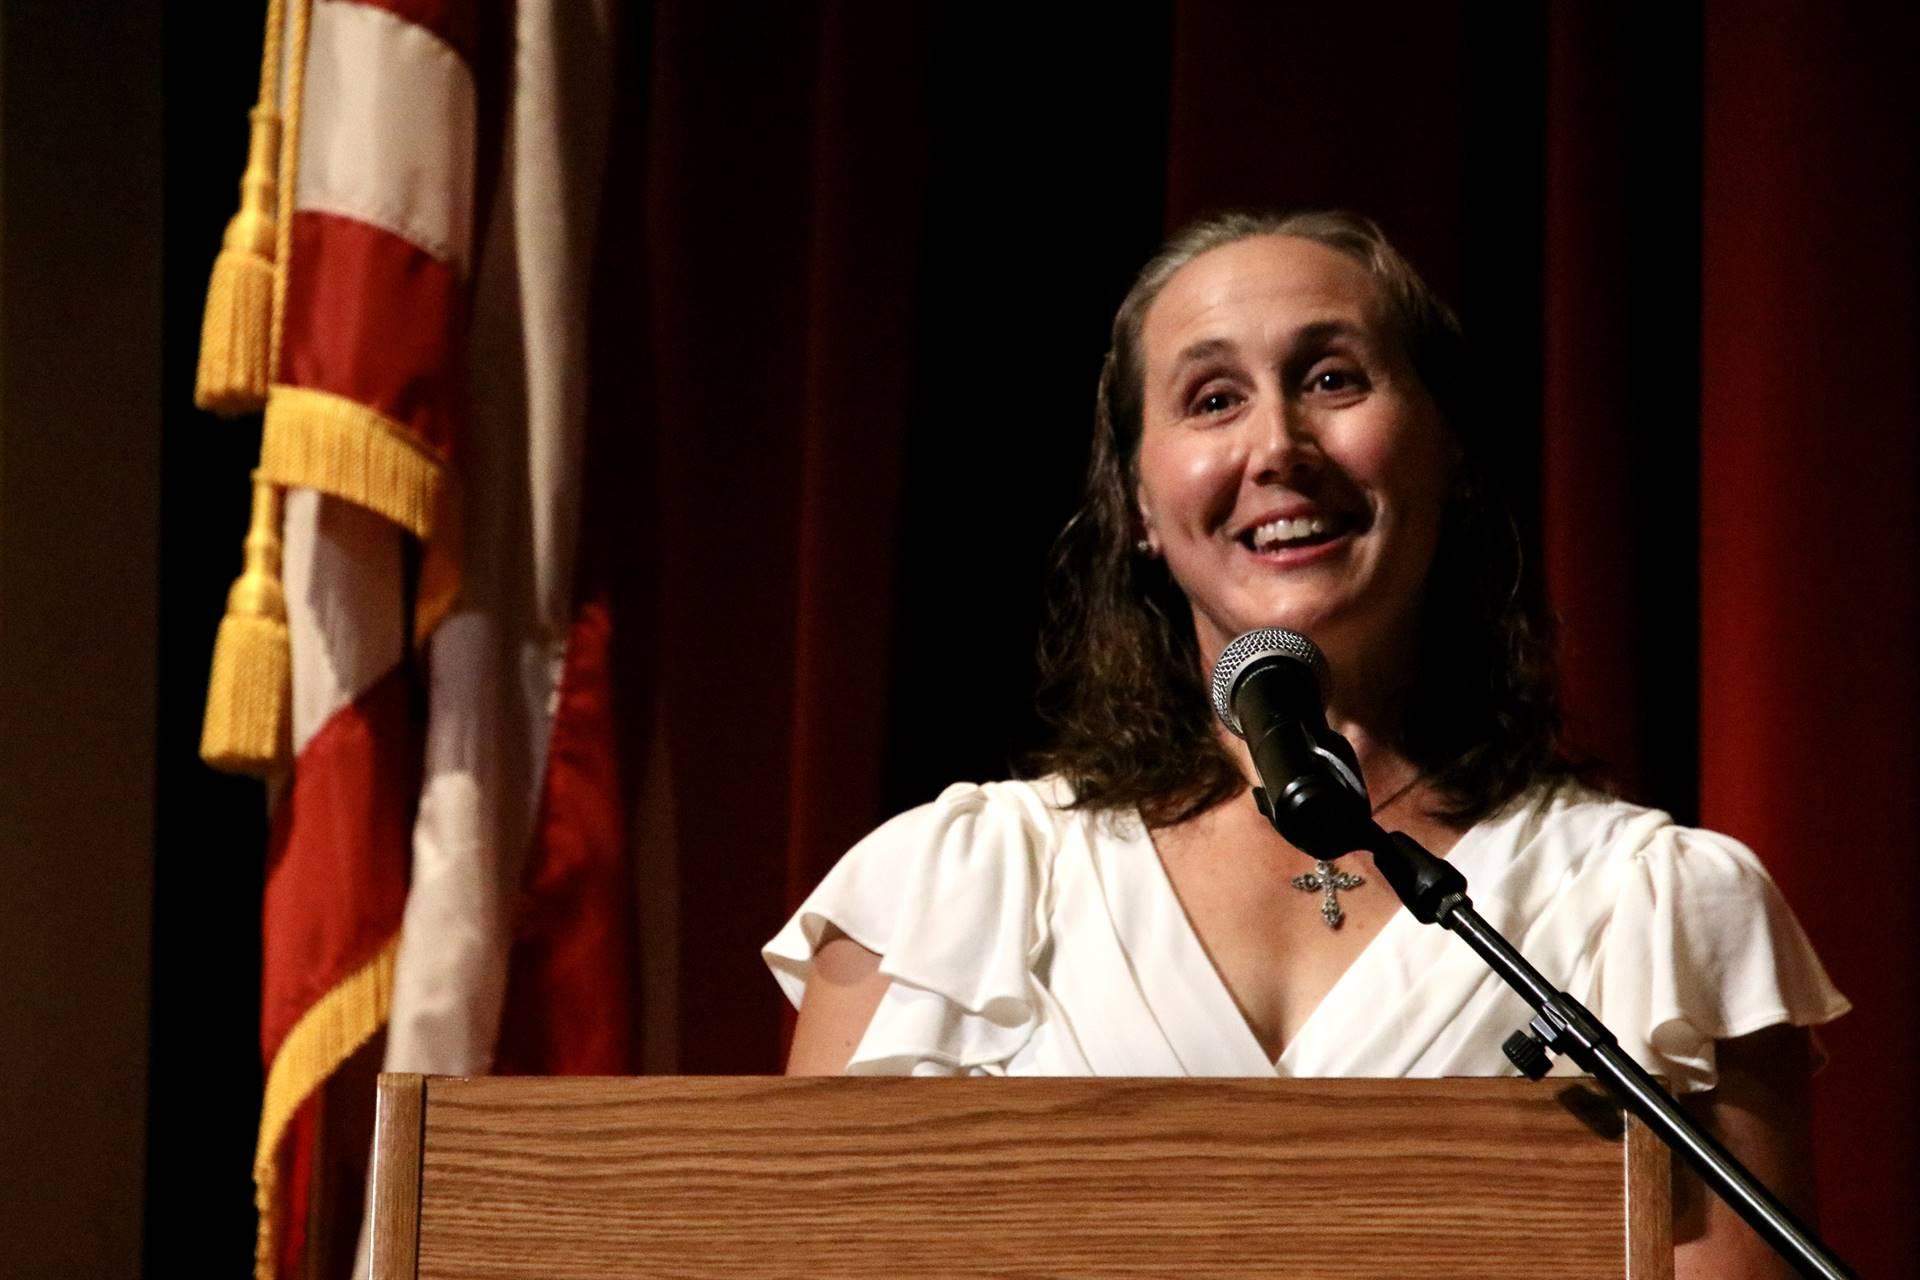 Hall of Distinction honoree - Margo Barrows